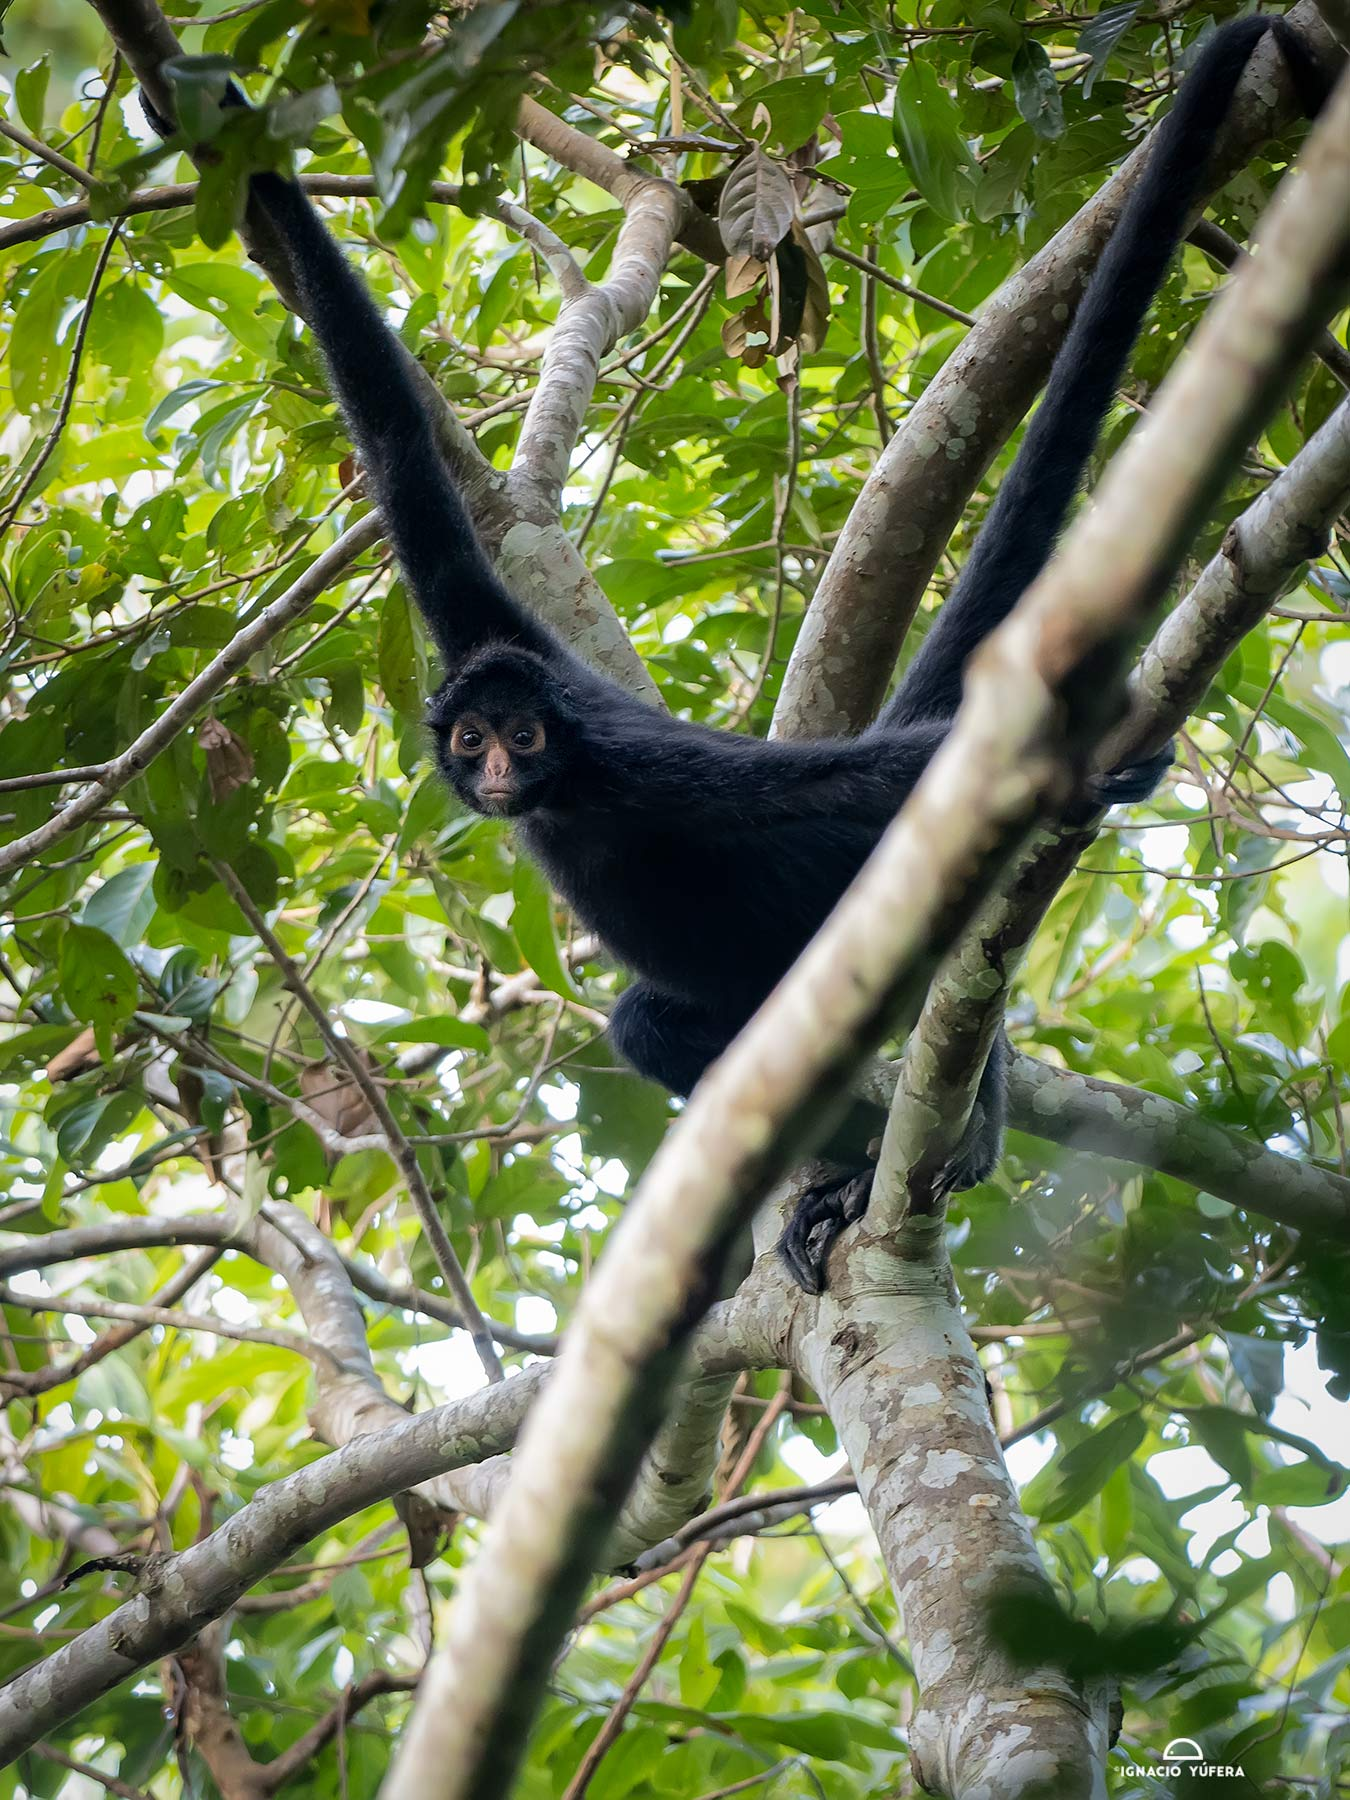 eruvian Spider Monkey (Ateles chamek), Madre de Dios, Peru